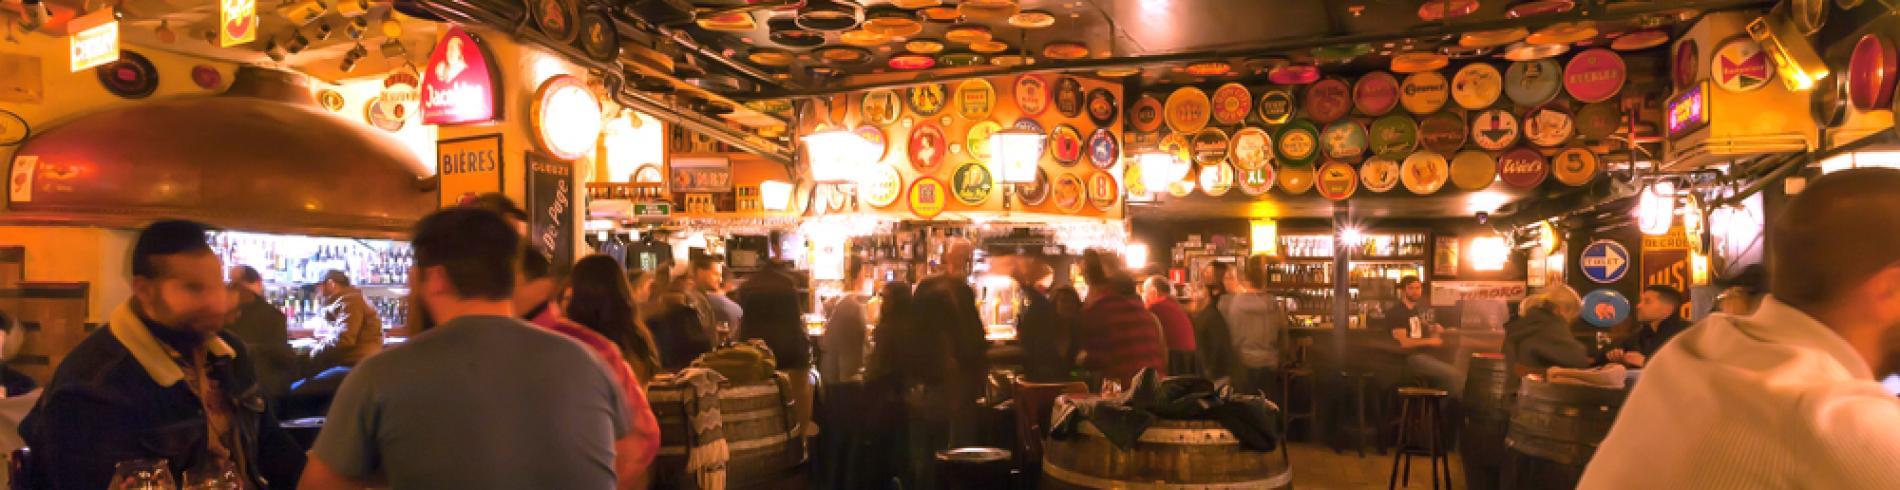 Bar in Brussels